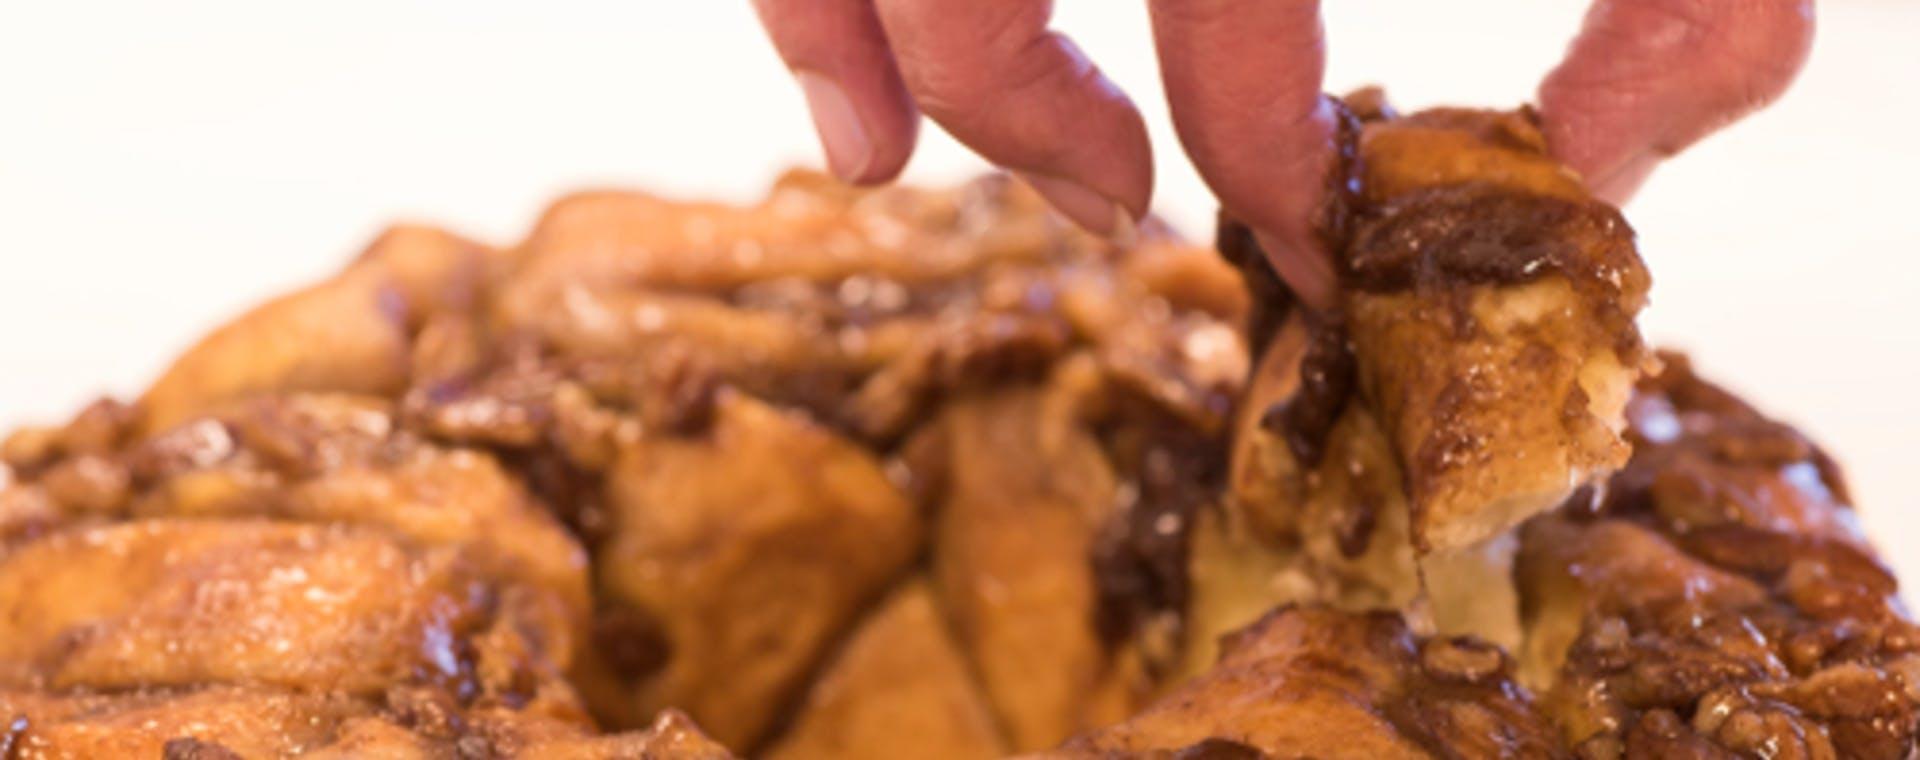 Cinnamon & Pecan Pull Apart Bread with Cinnamon & Brown Sugar flavored butter